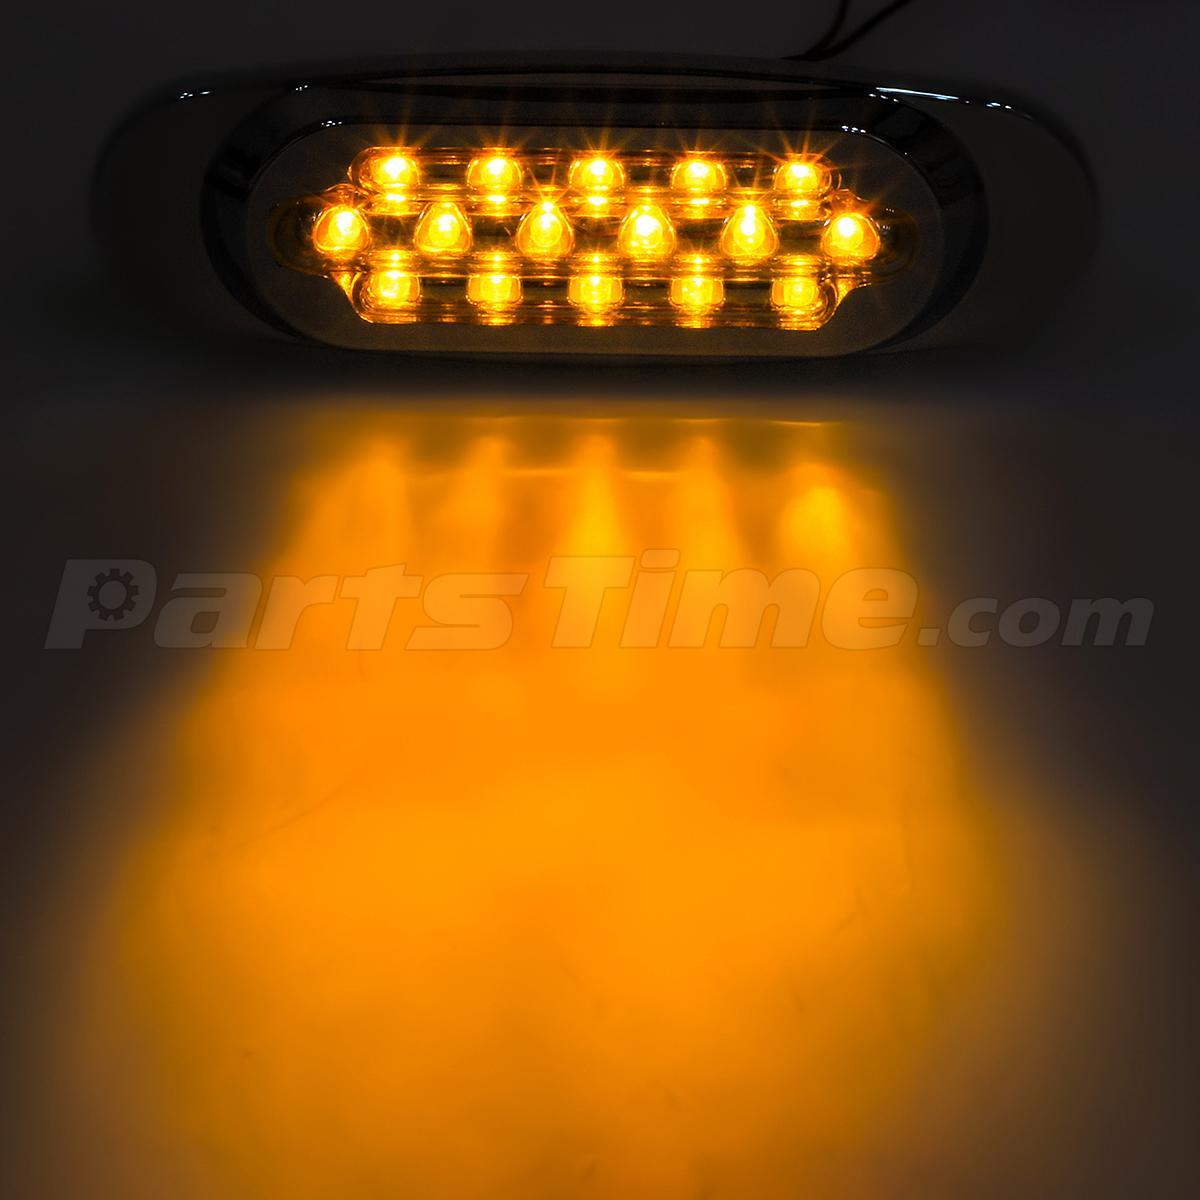 medium resolution of  fuse panel questions 165160 11 p a2v5bglmzq 2009 kenworth w900 headlight